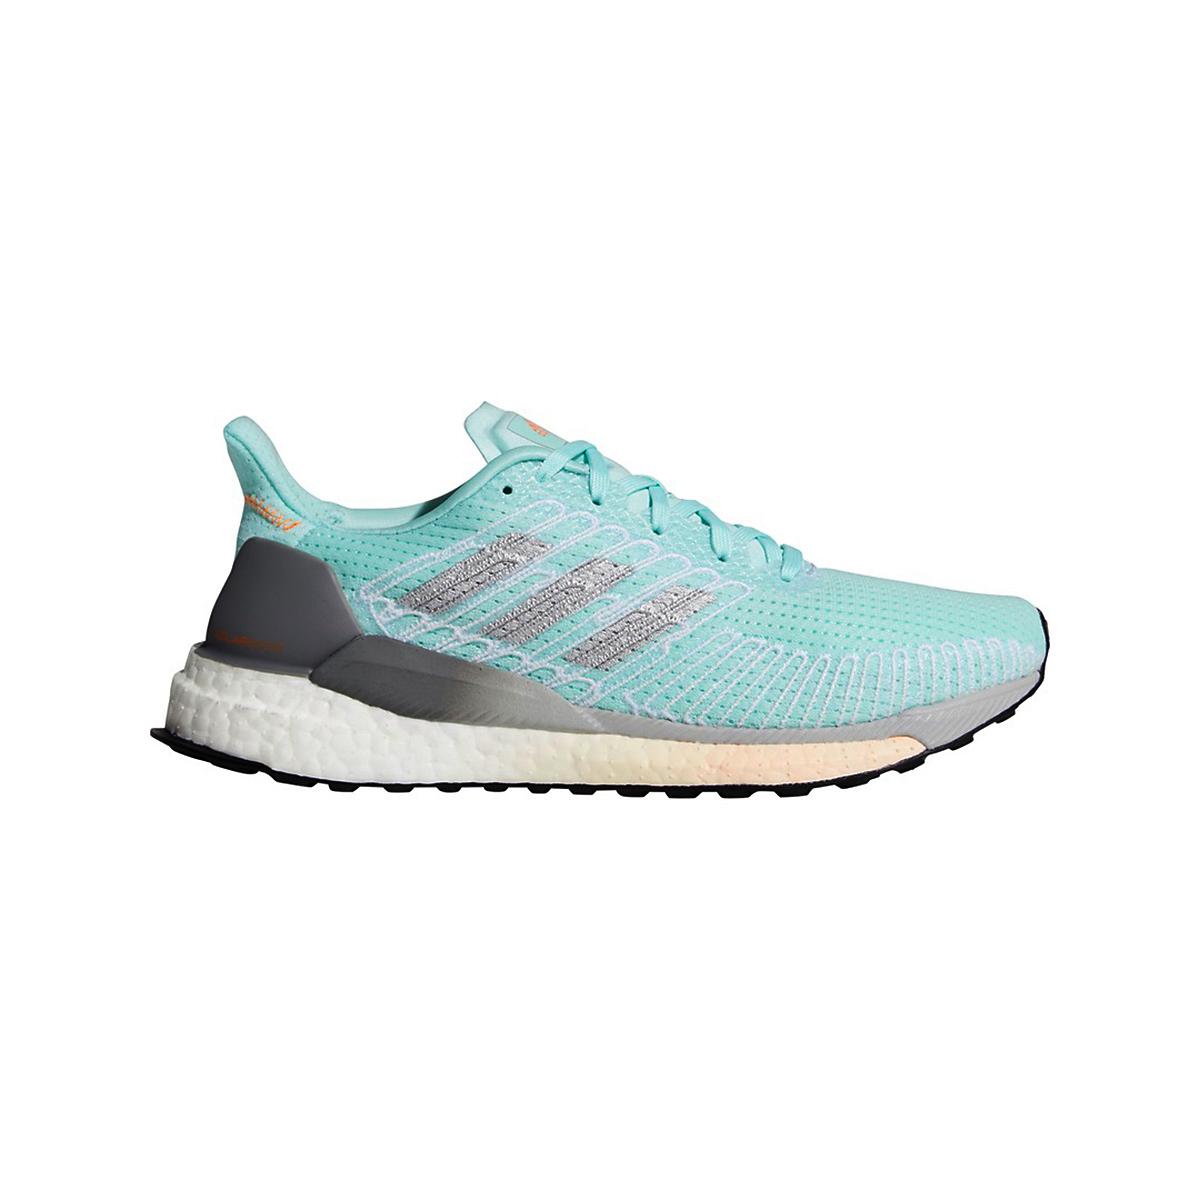 Women's Adidas SolarBOOST 19 Running Shoe - Color: Frost Mint/Silver Metallic/Grey - Size: 5 - Width: Regular, Frost Mint/Silver Metallic/Grey, large, image 1